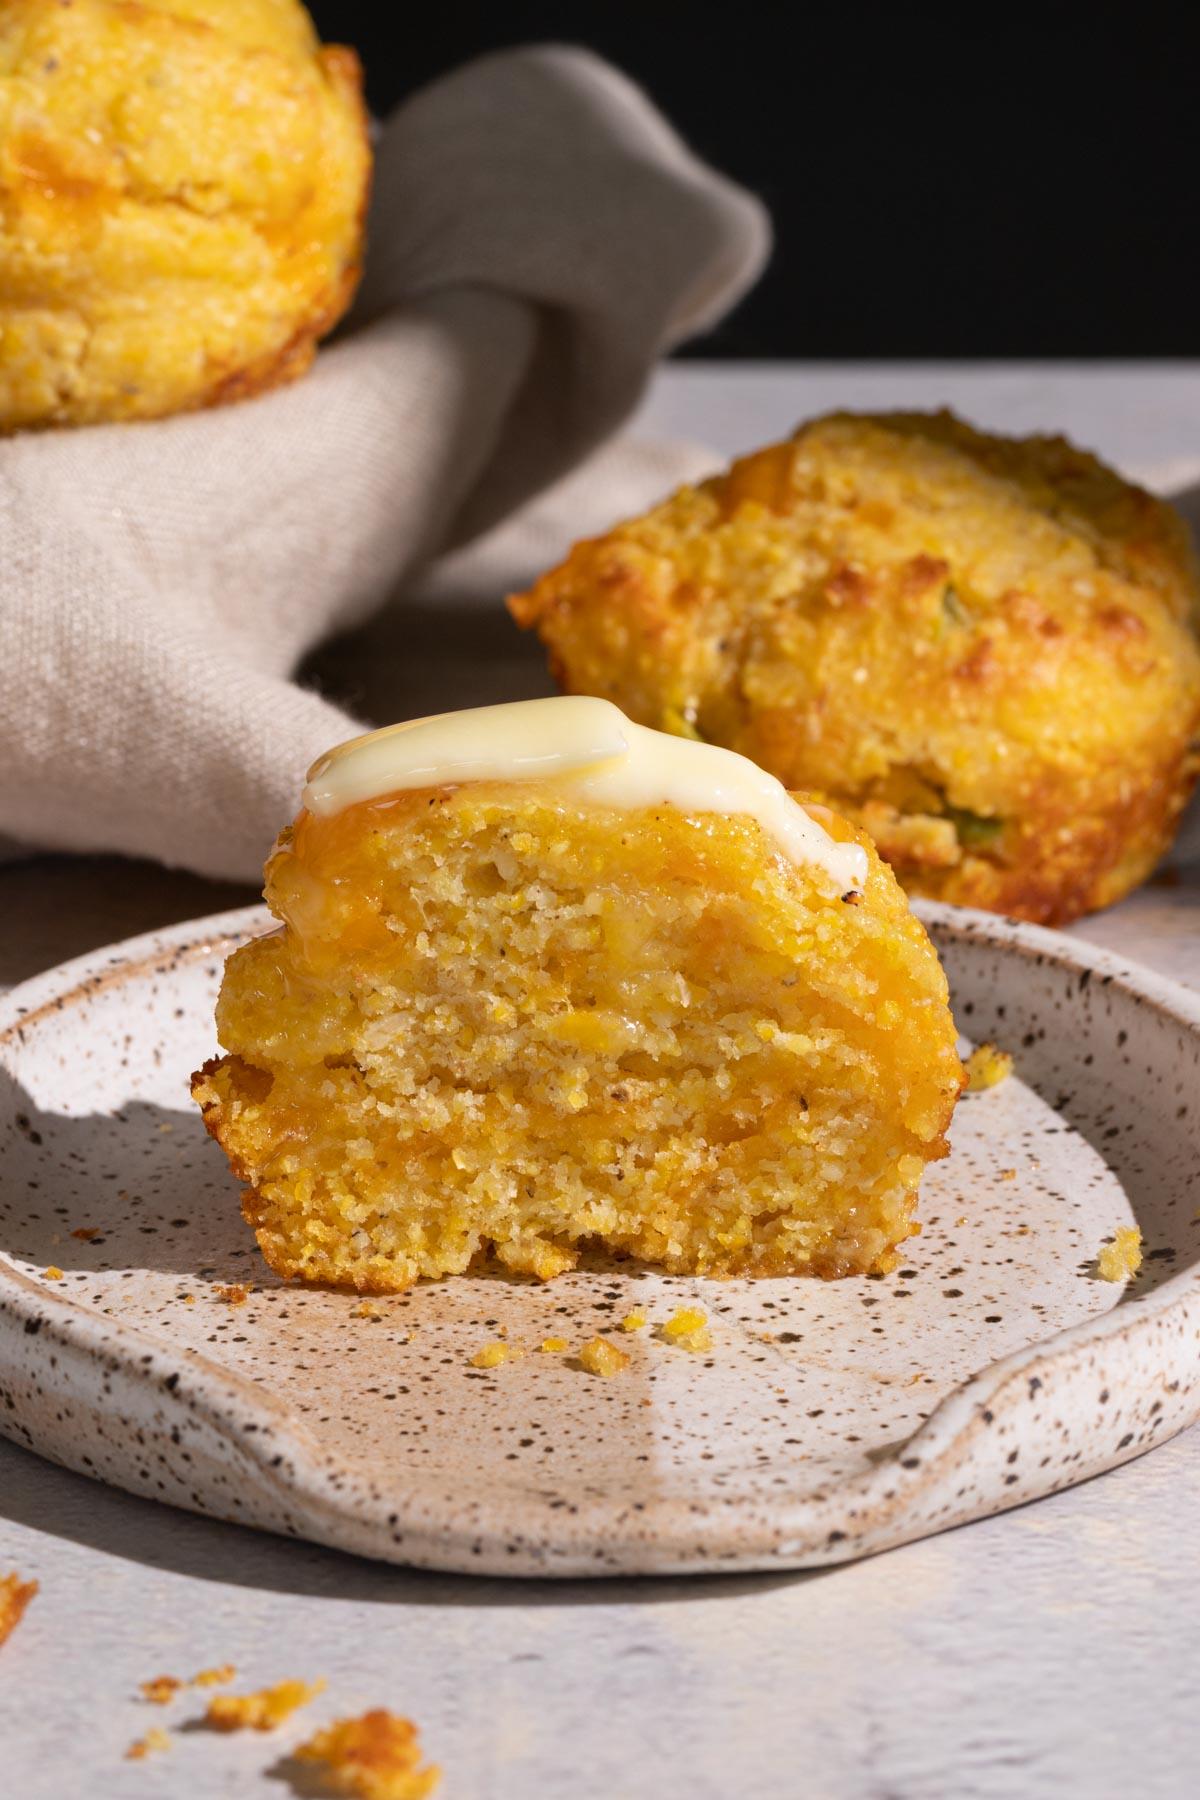 Jalapeno cheddar cornbread muffin on a plate